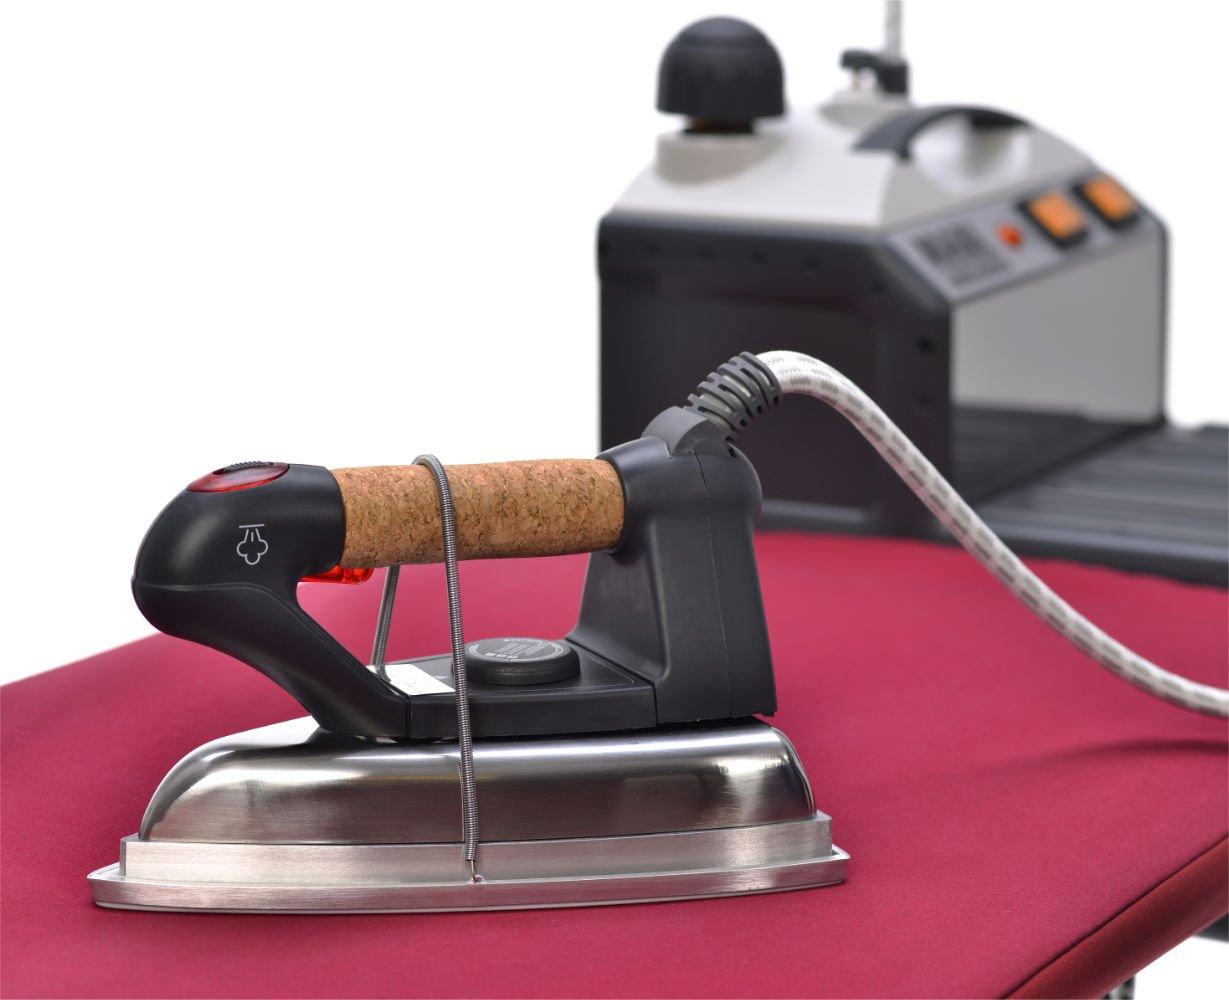 Mabi 404 – Mabi´s Iron Shoe – Teflon Shoe – Teflon Soleplate – Protective Cover – Avoid shine on fabrics